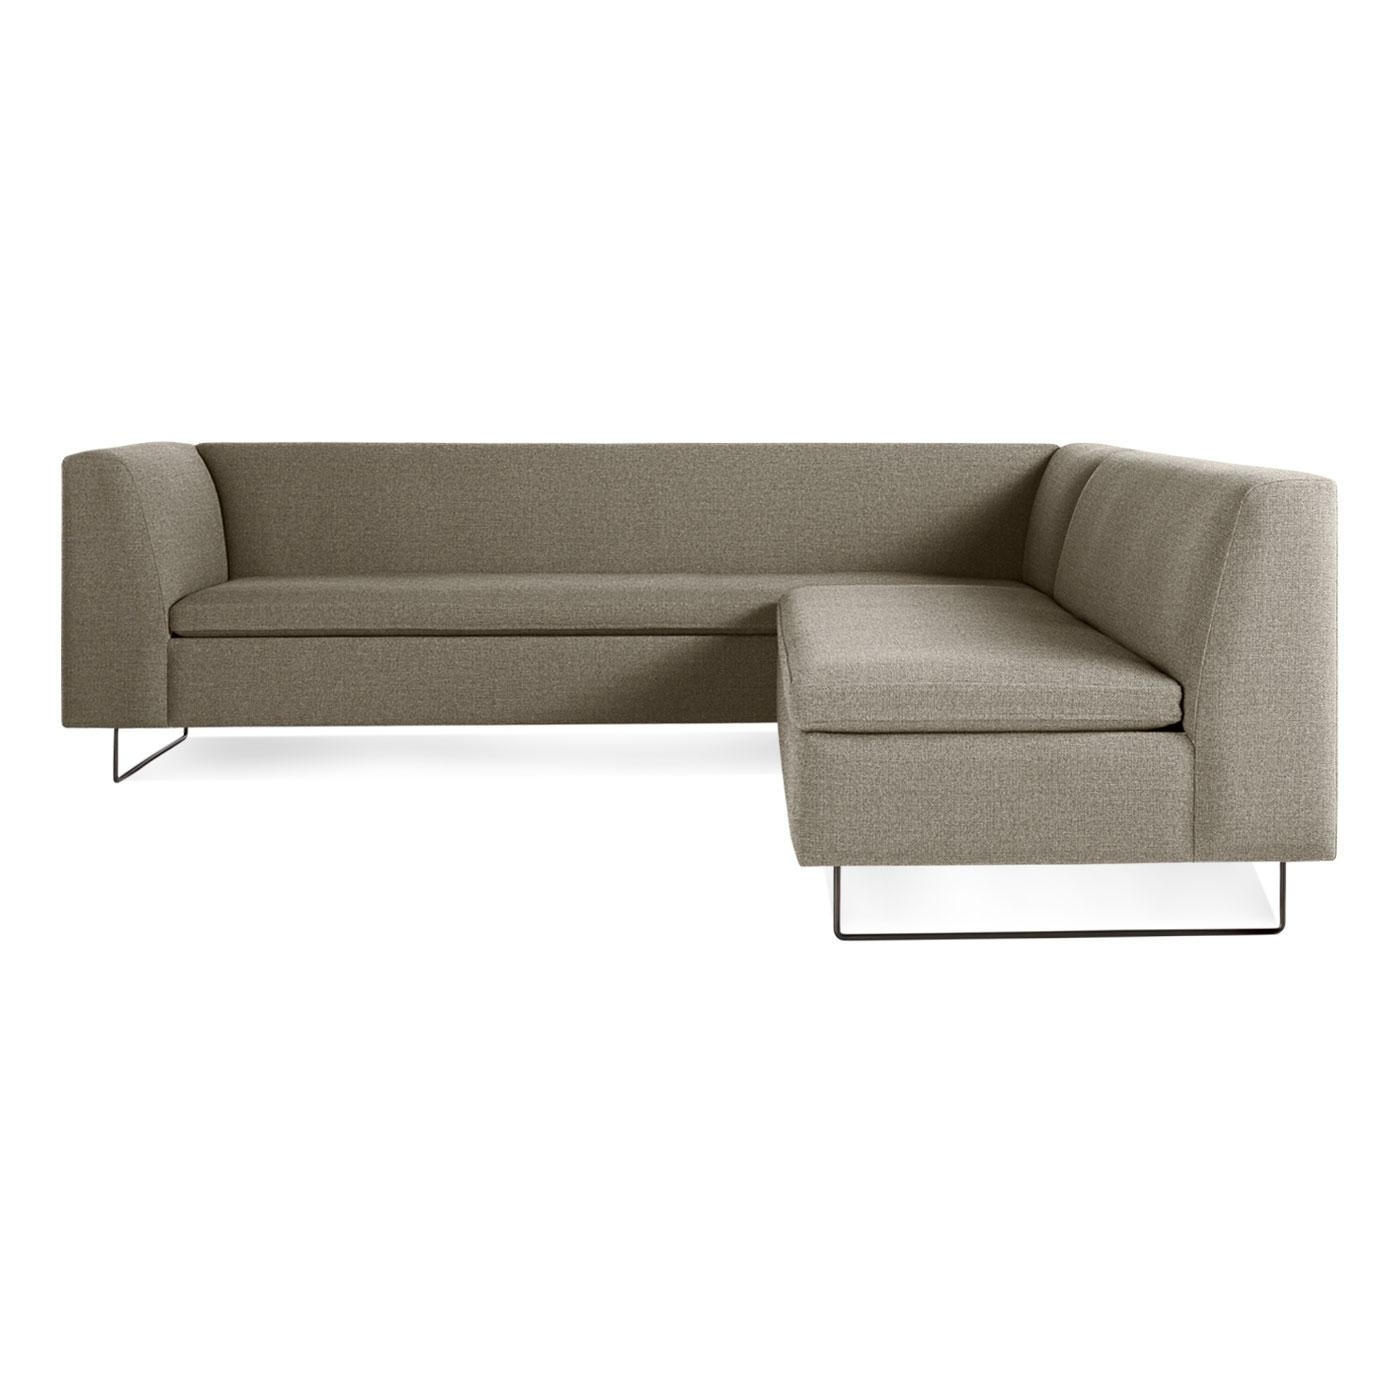 Collection Sleek Sectional Sofa - Mediasupload within Sleek Sectional Sofas (Image 4 of 10)